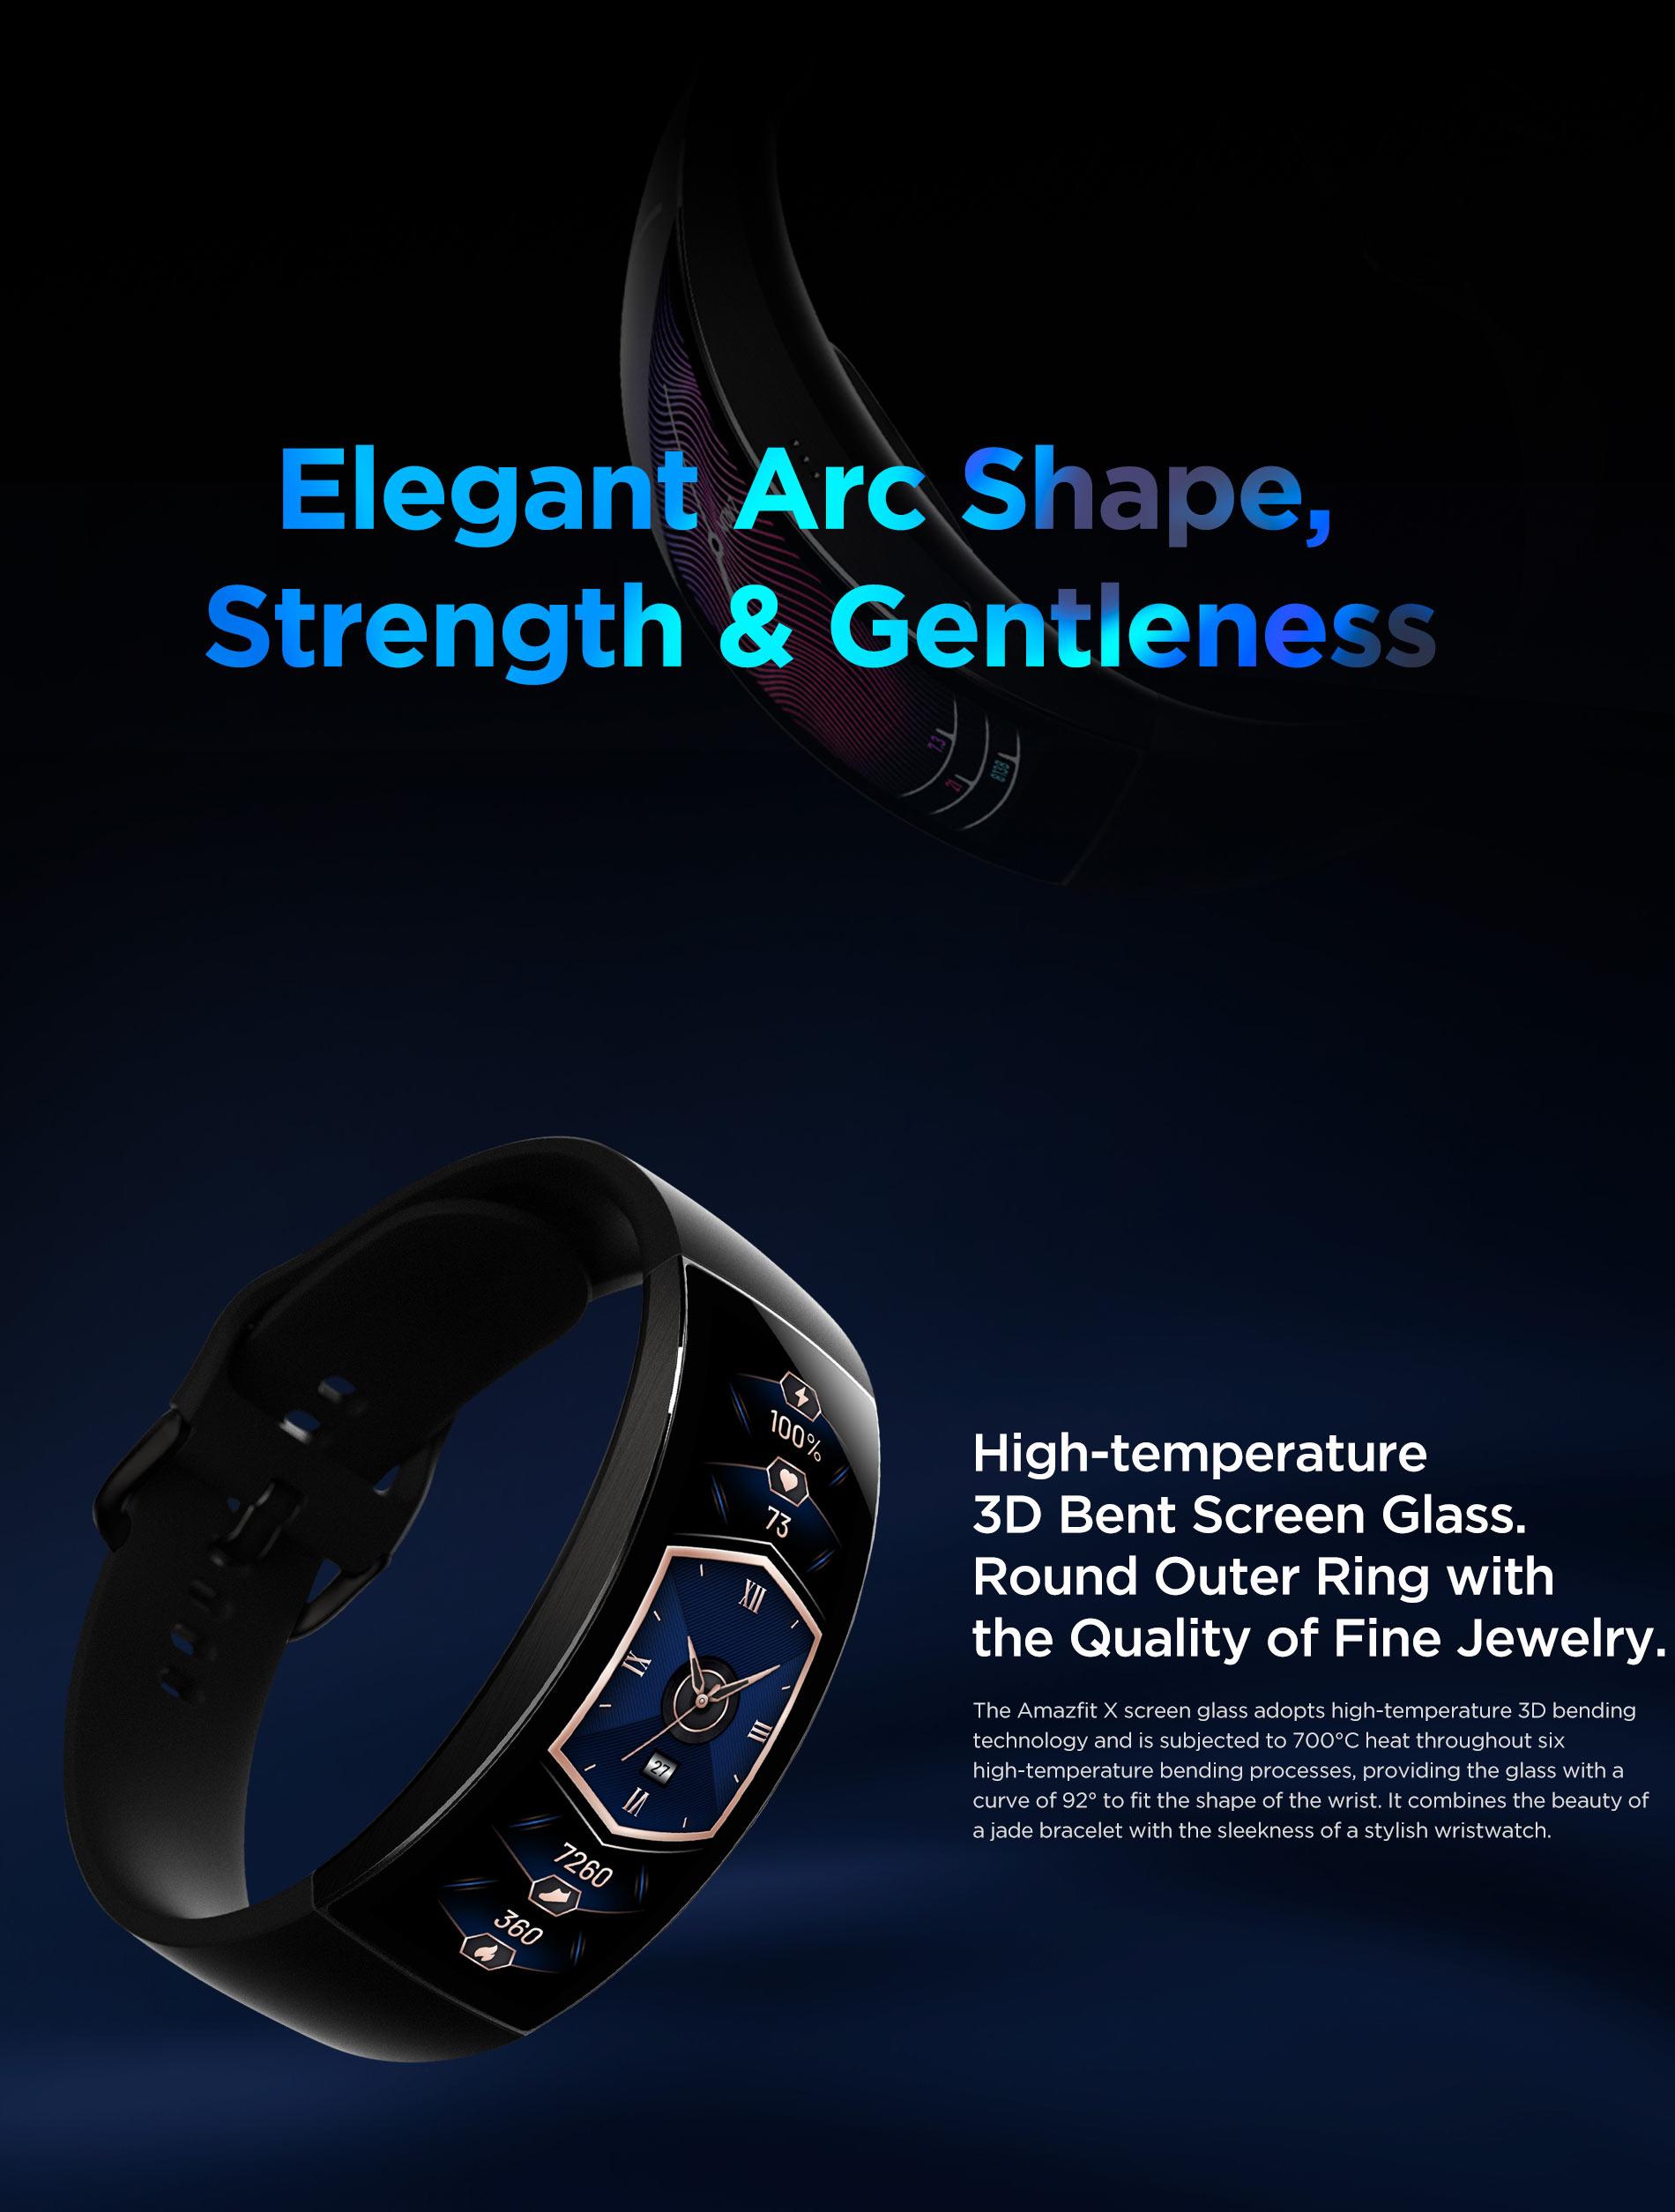 Amazfit X Curved Smartwatch 14